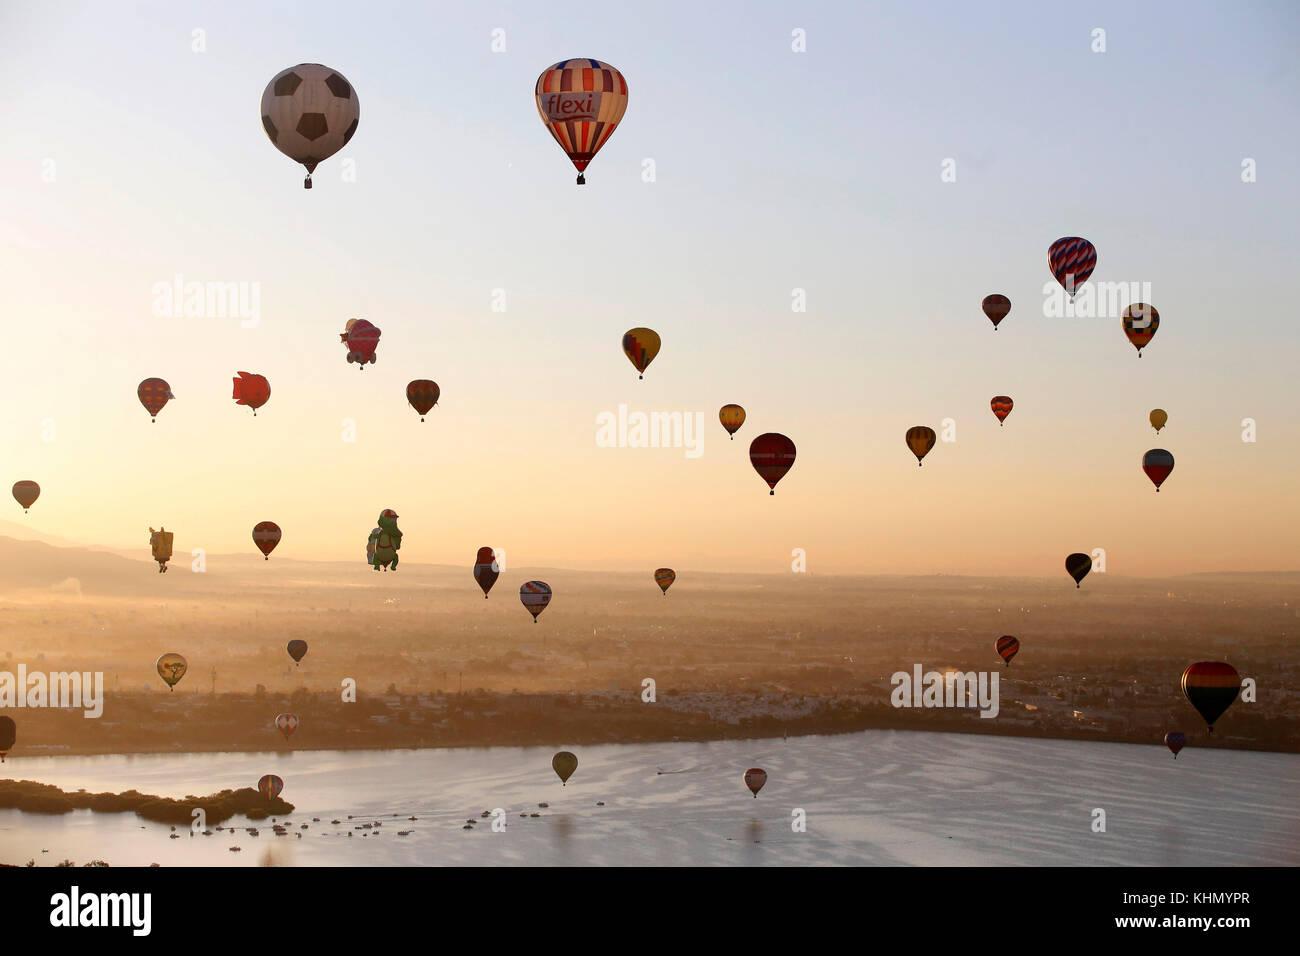 Leon, Guanajuato state, Mexico, 18 November 2017. 18th November, 2017. Dozens of hot air balloons take flight during - Stock Image